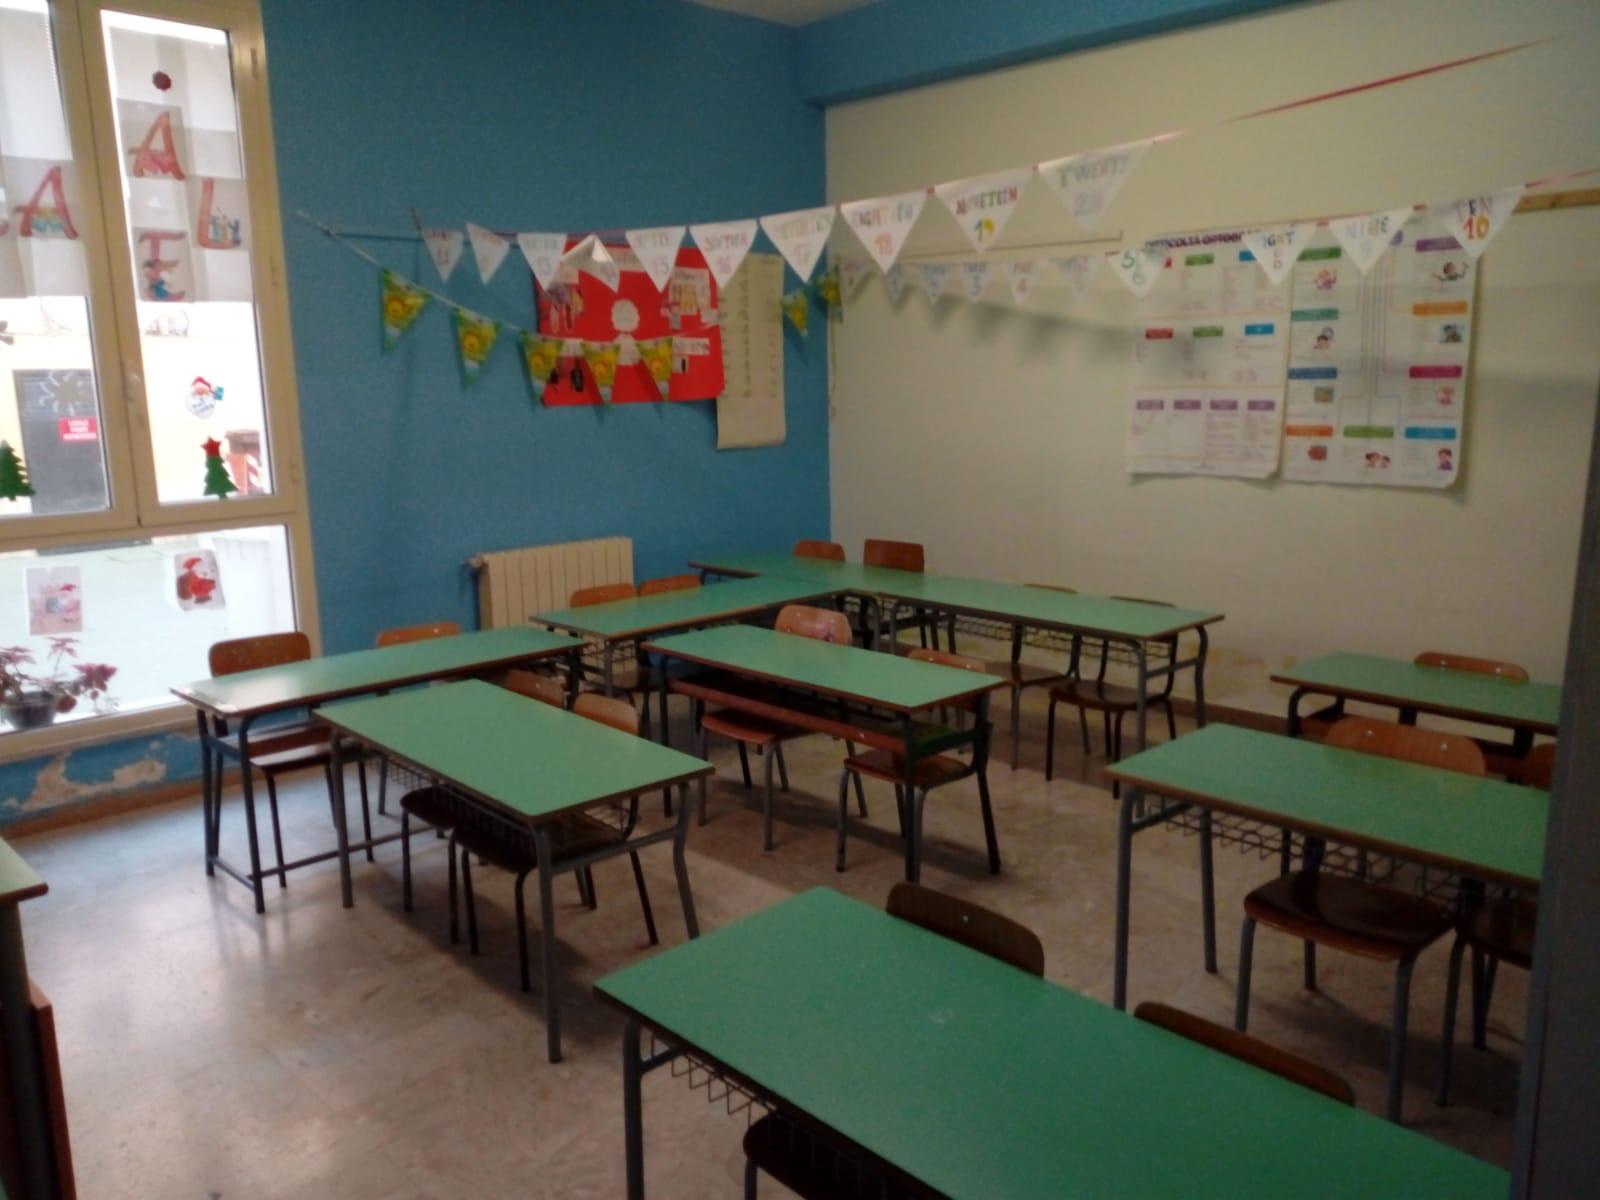 scuola Cavour aula vuota